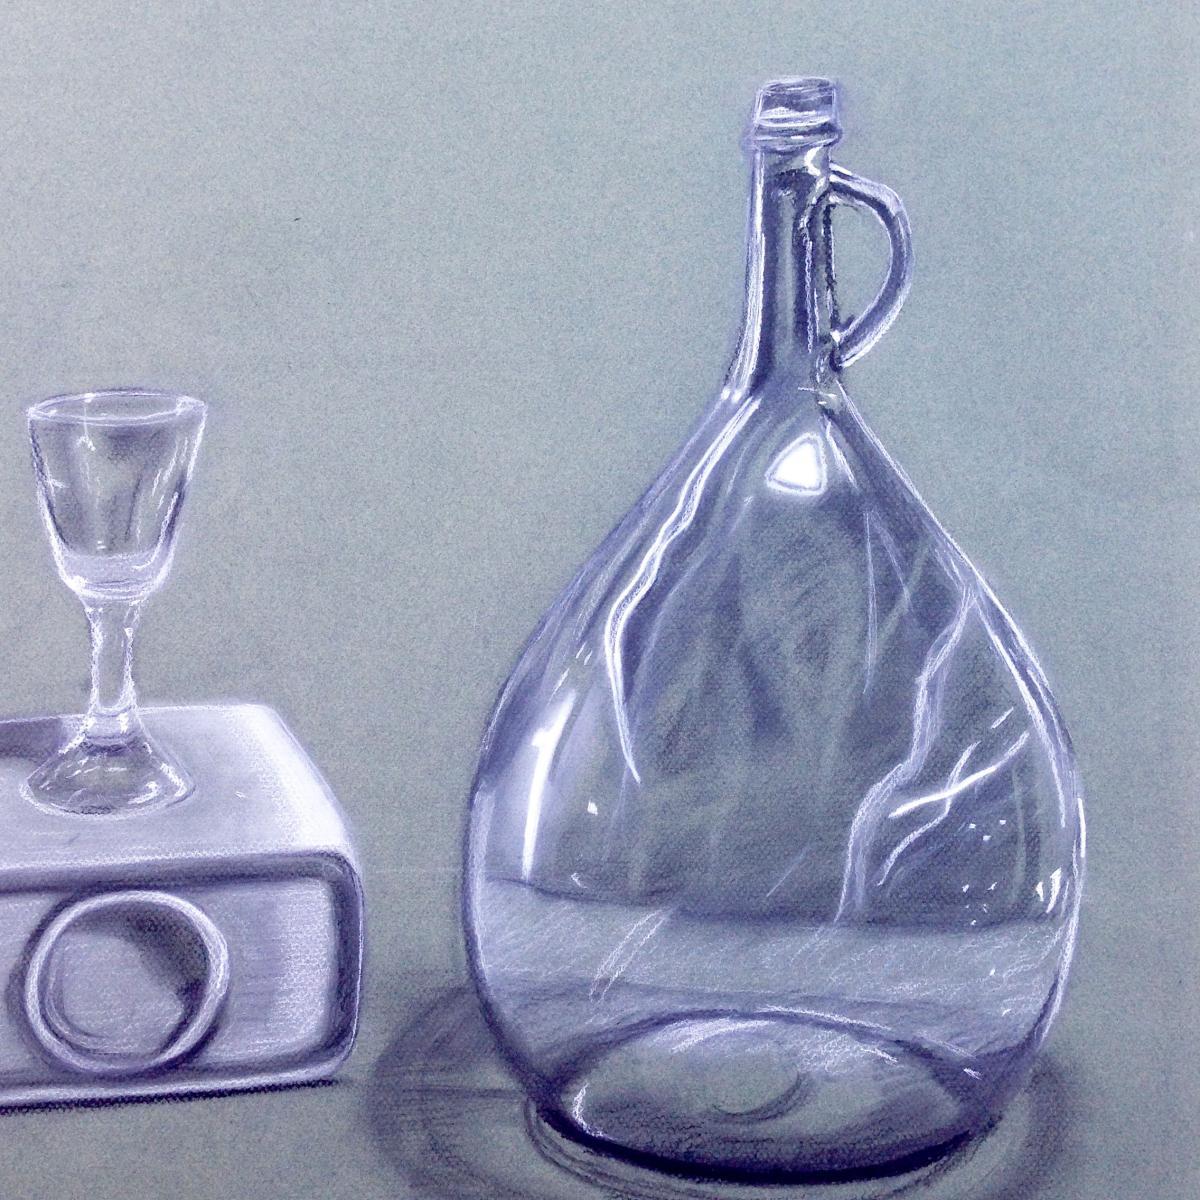 Chalk drawing of lavender tear-drop shaped perfume bottle.